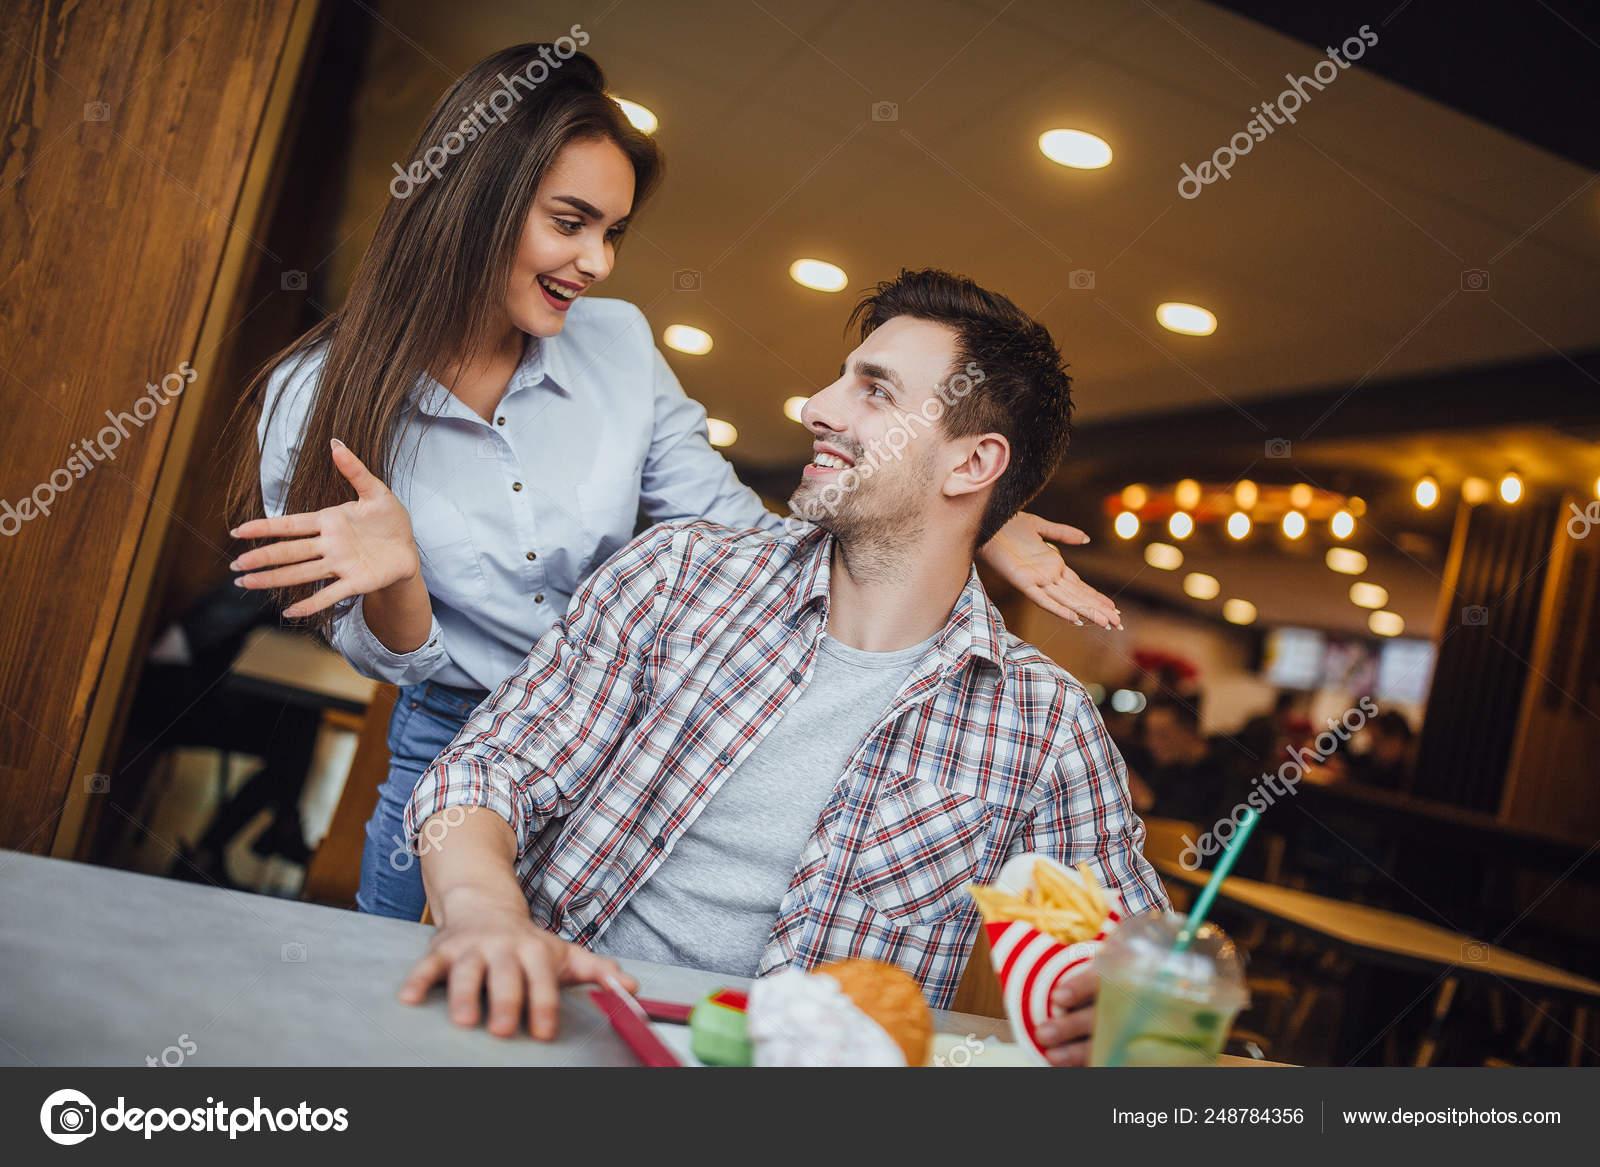 Dating καφέ-Event που χρονολογούνται από τη Νέα Υόρκη